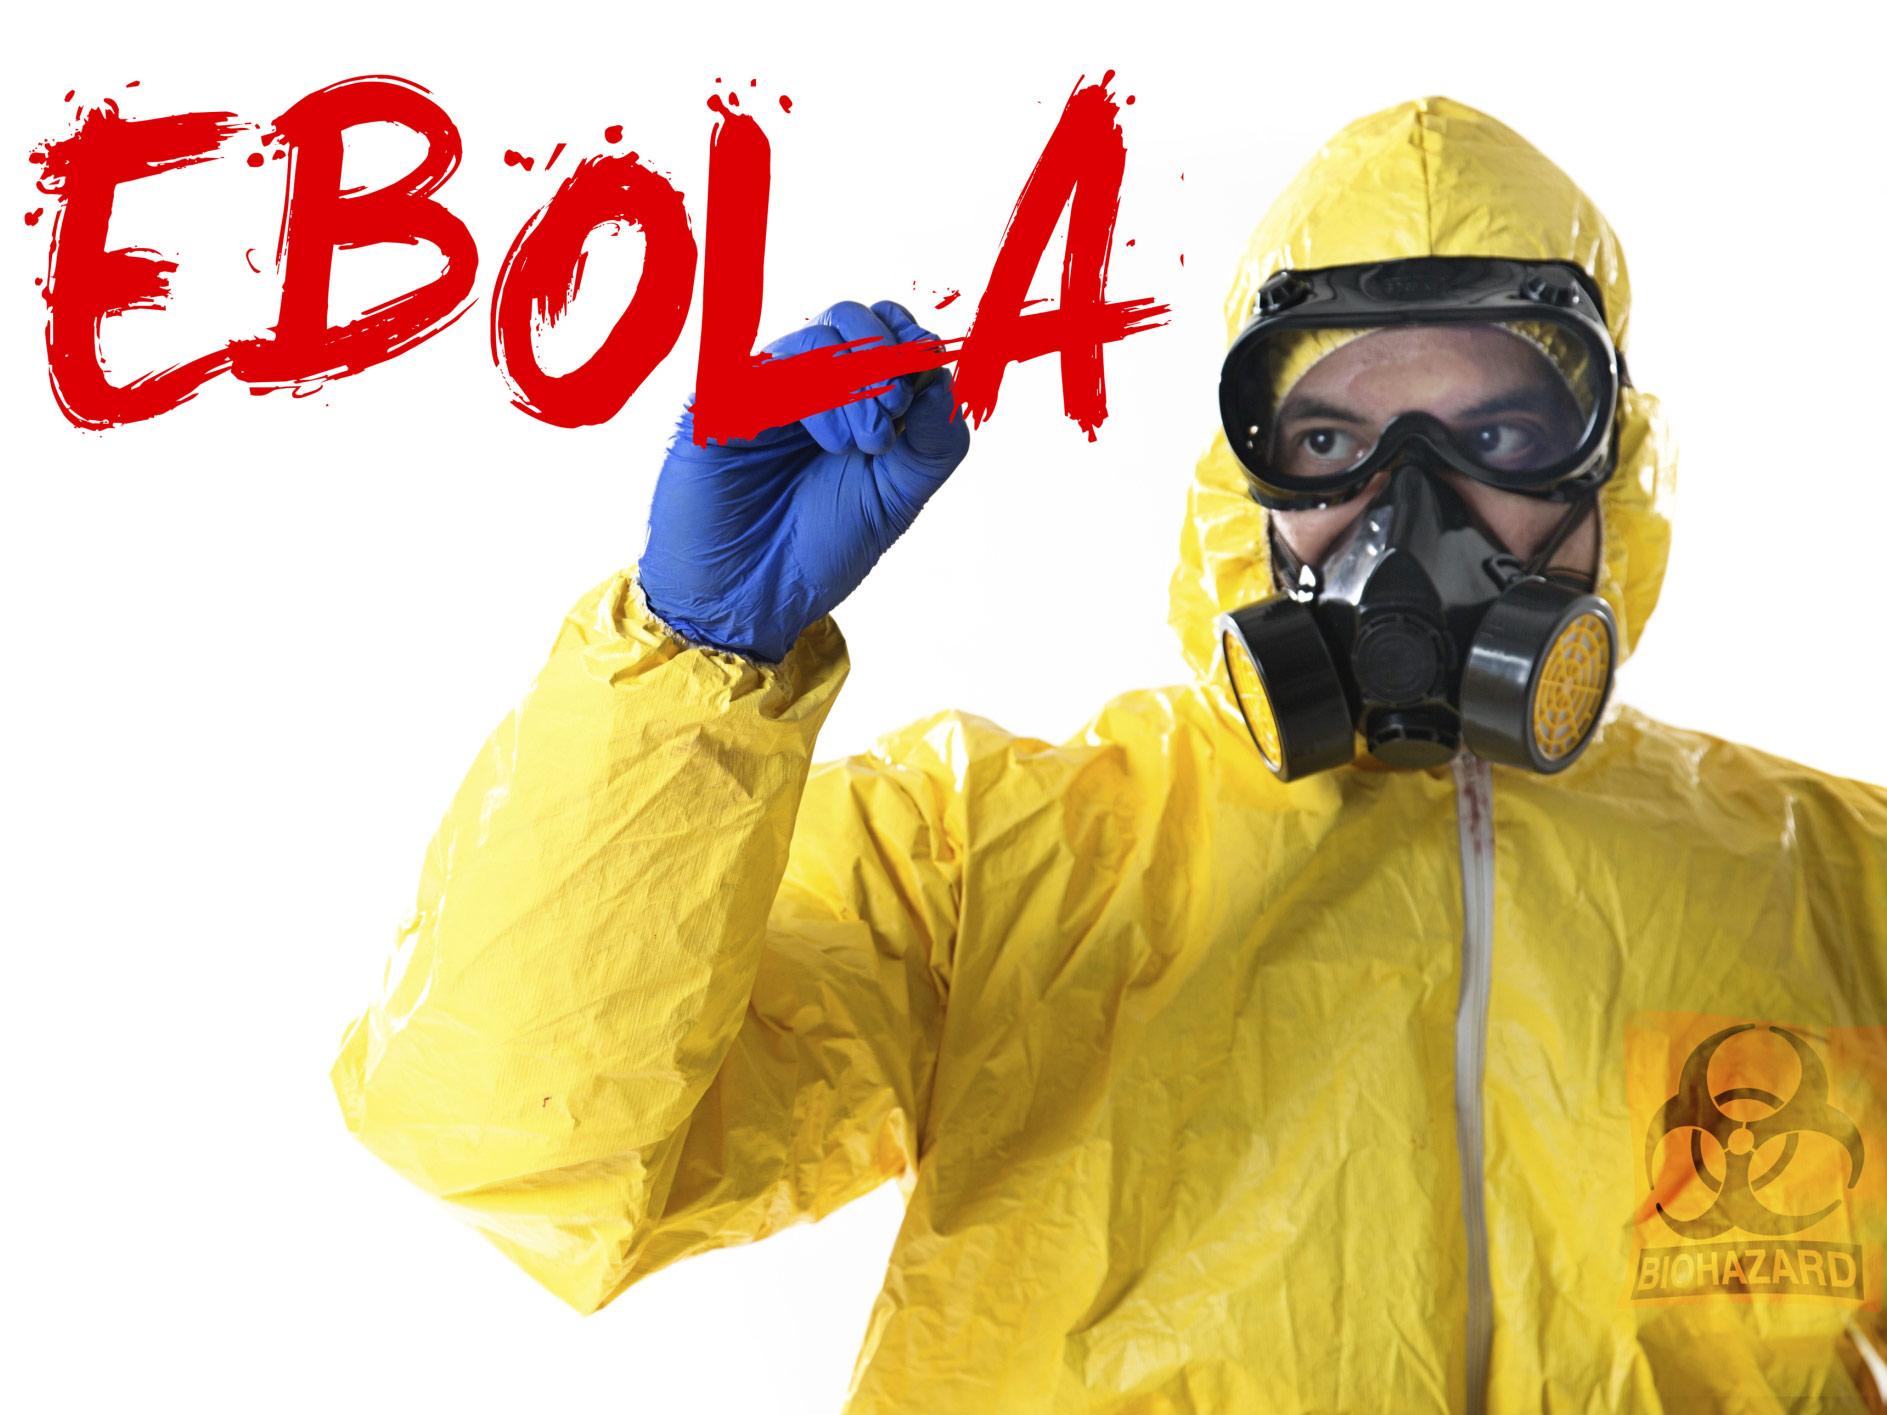 Is the U.S. Ebola strategy a tragic mistake?